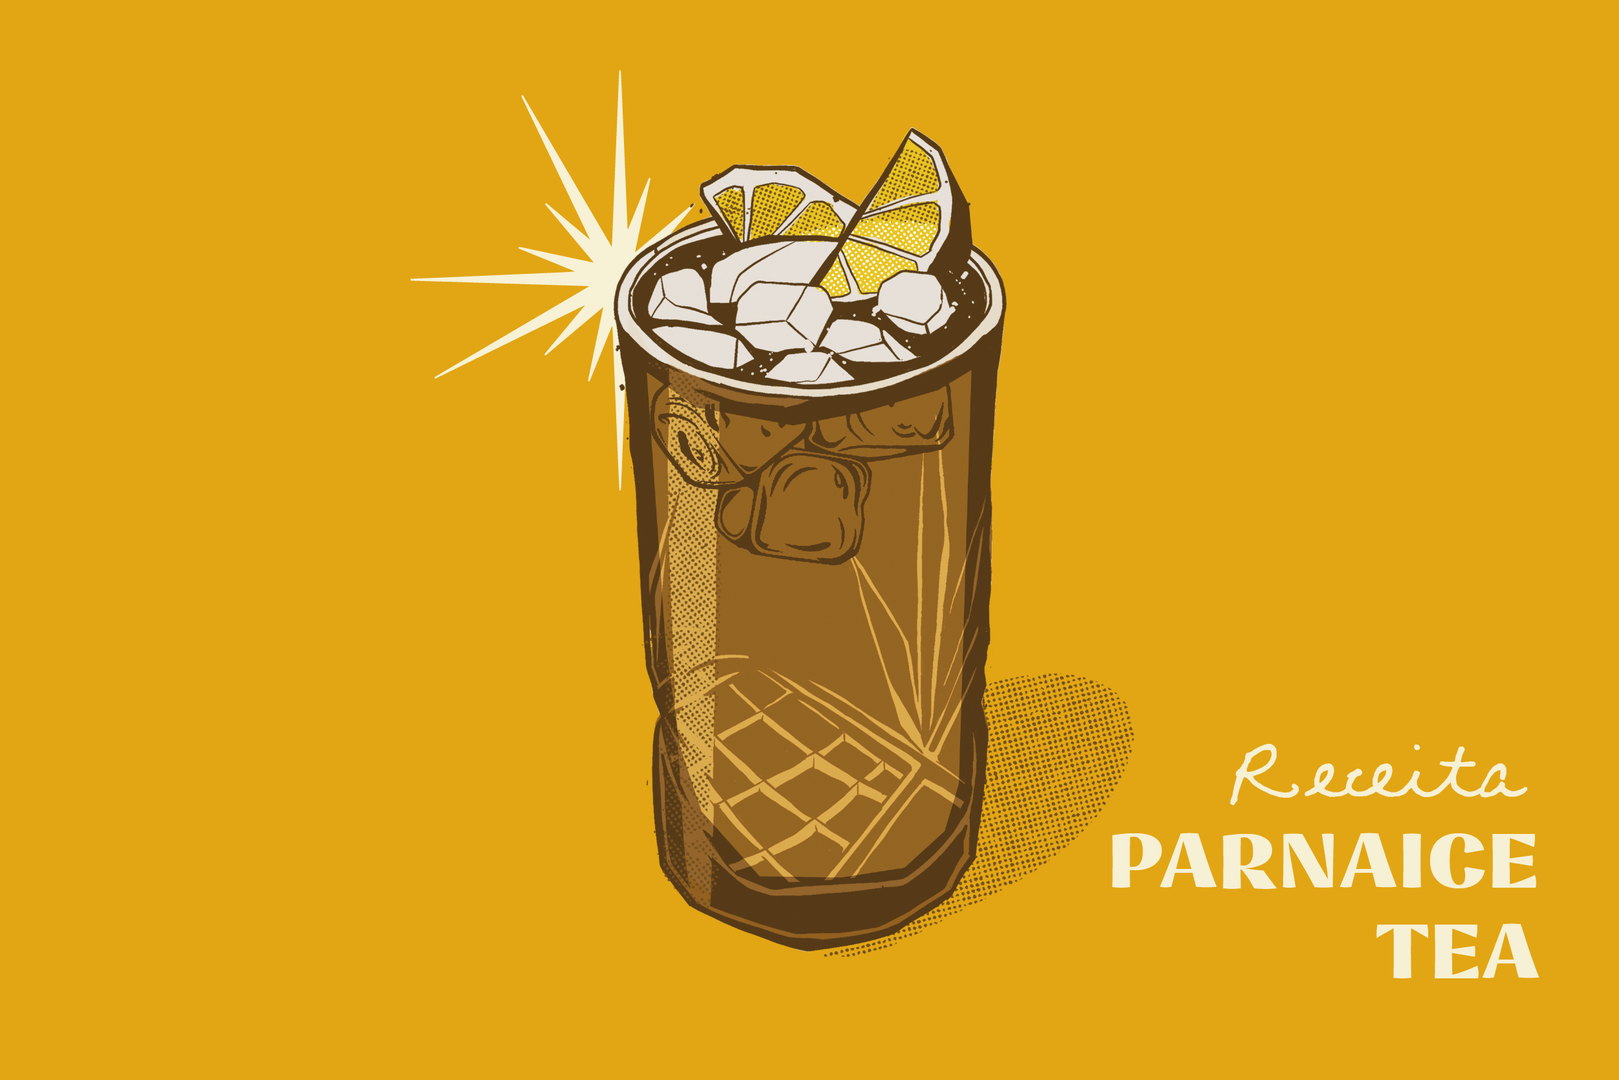 Parnaice Tea